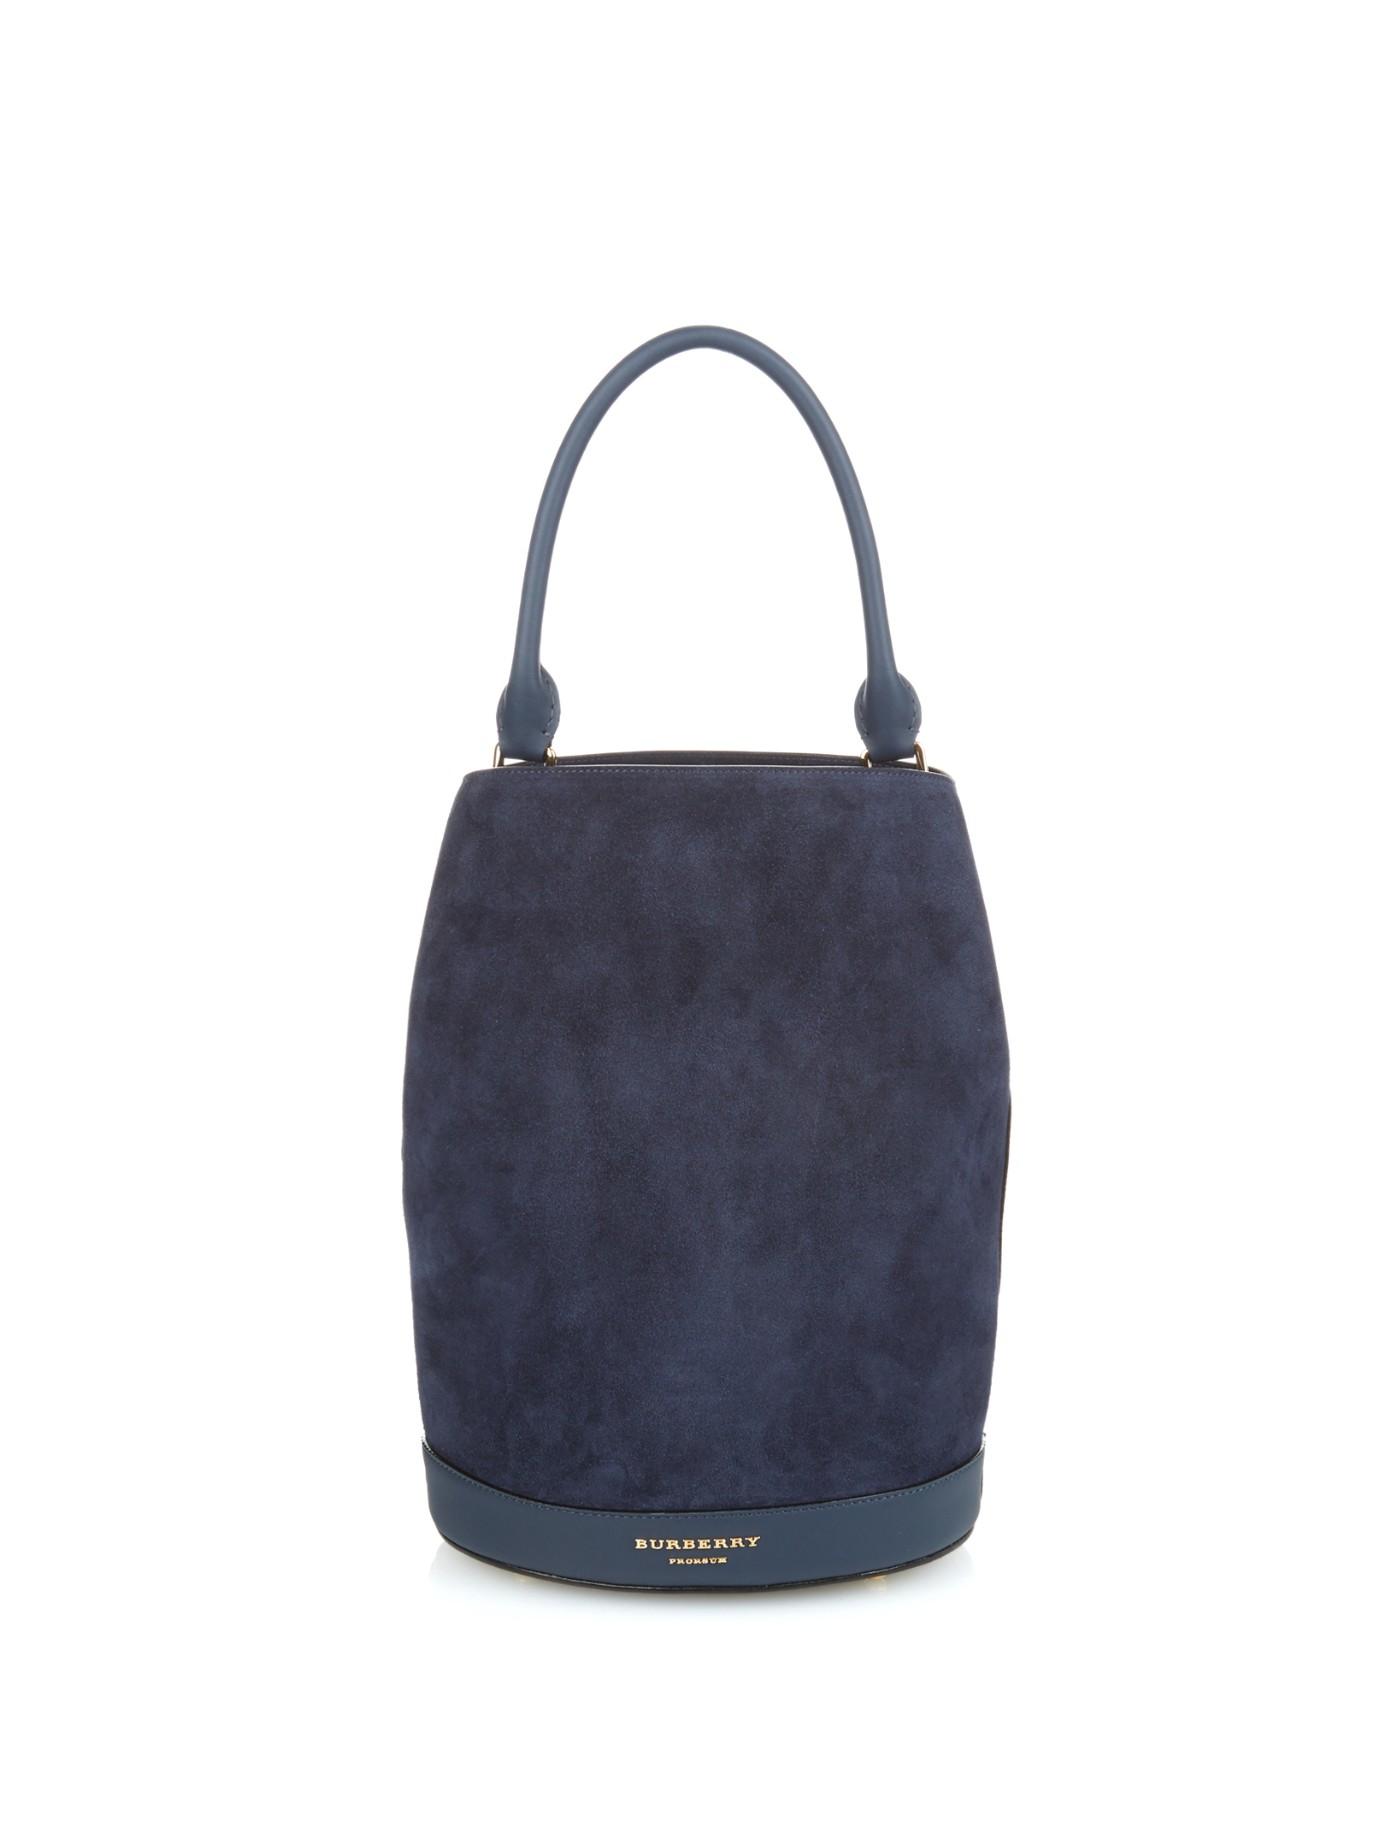 The Large Leather Bucket Bag - Blue Burberry TMoynzv